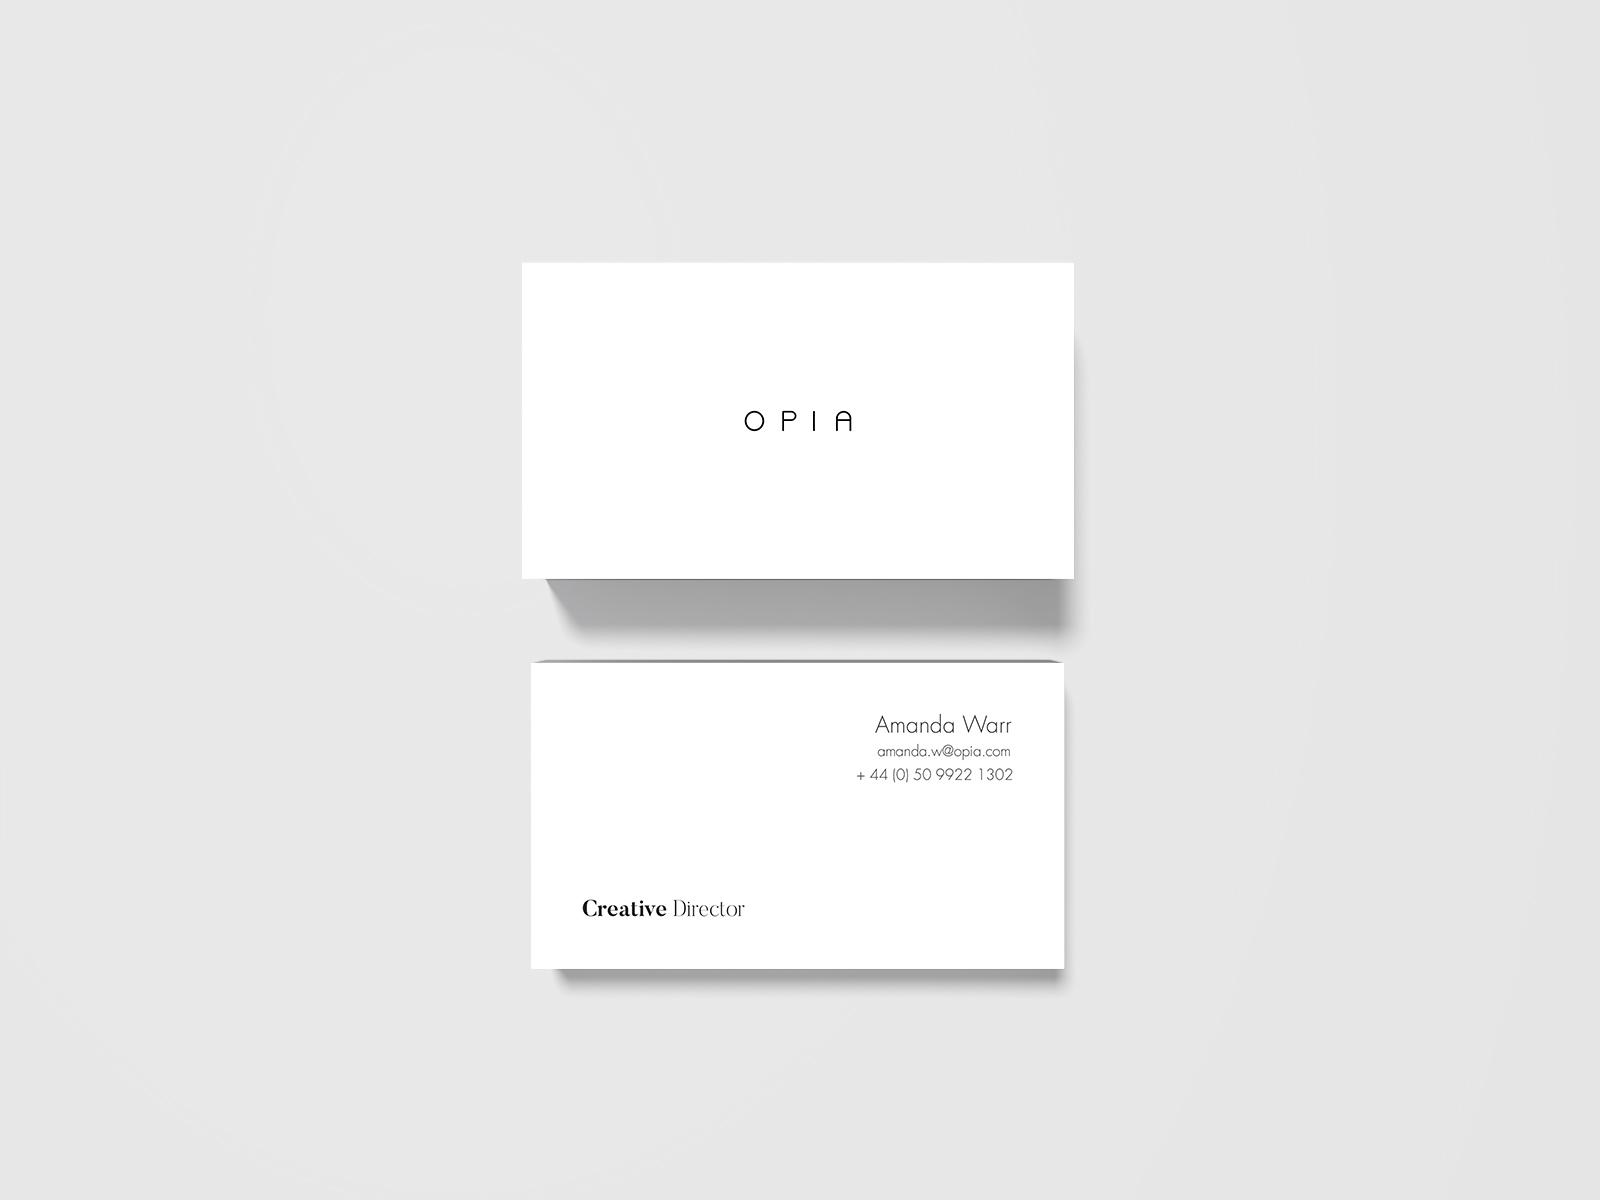 opia-mockup-business-cards.jpg